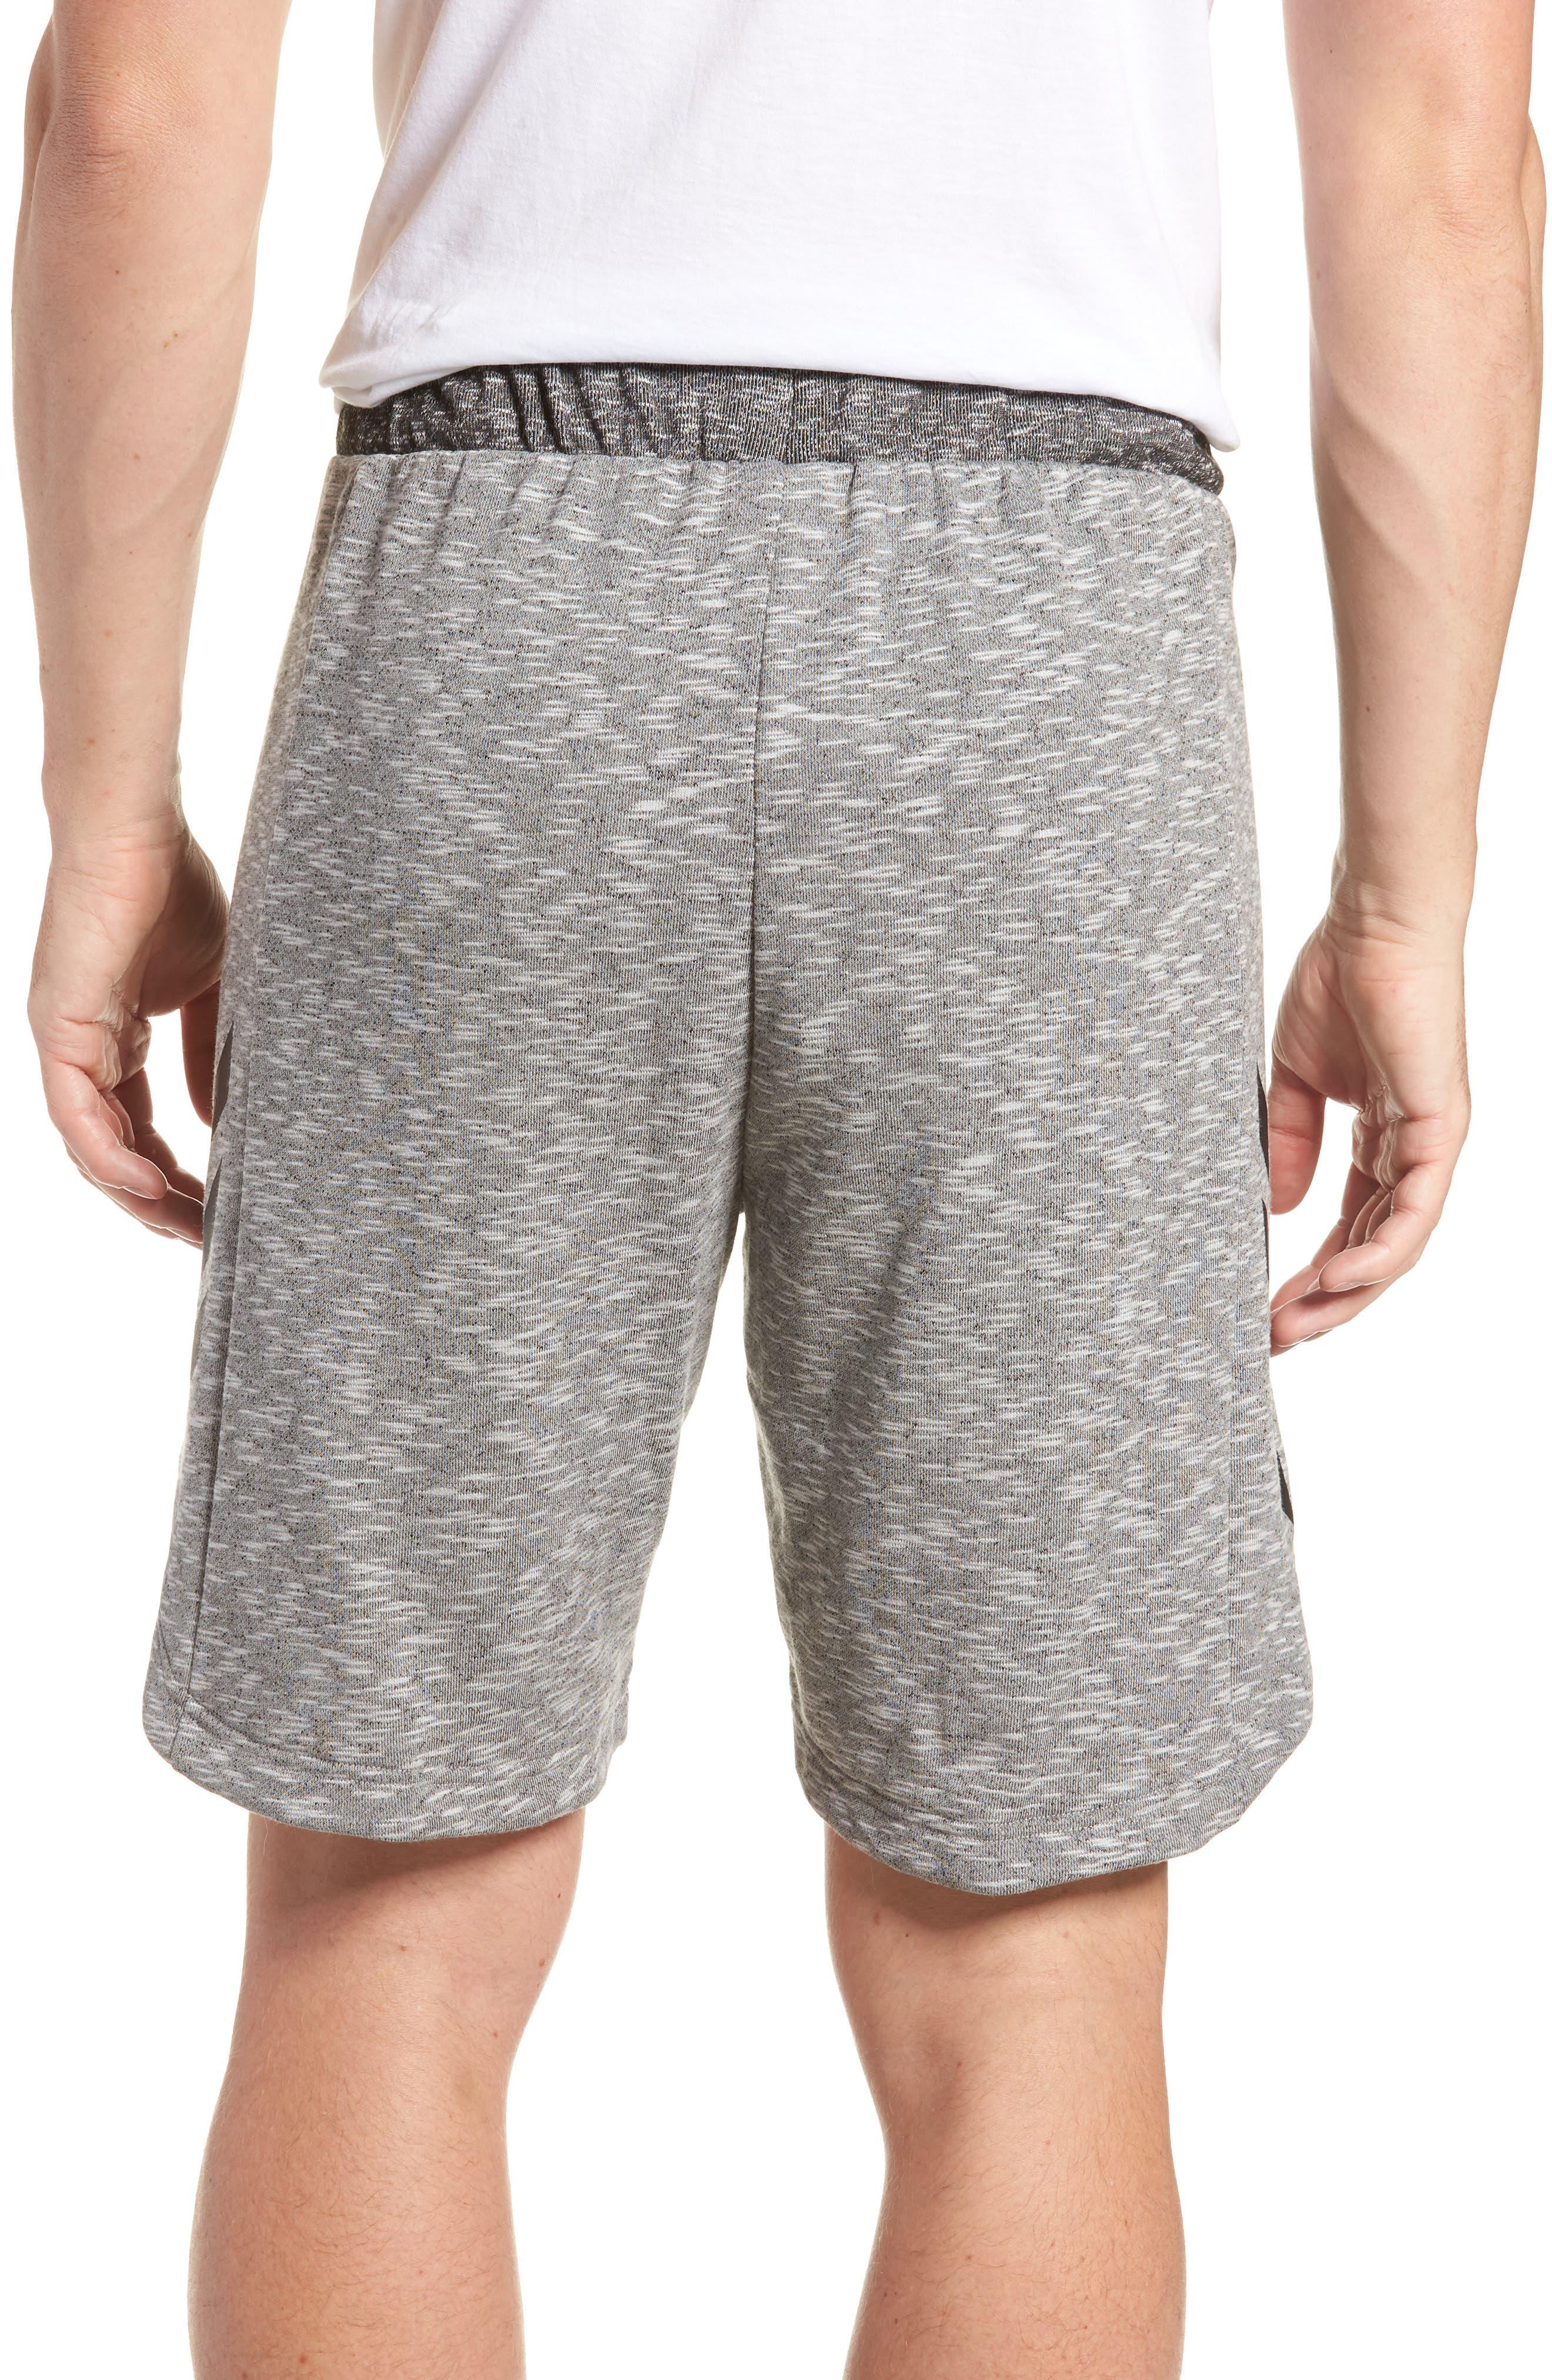 Pick Up Knit Shorts,                             Alternate thumbnail 2, color,                             Lgh Solid Grey